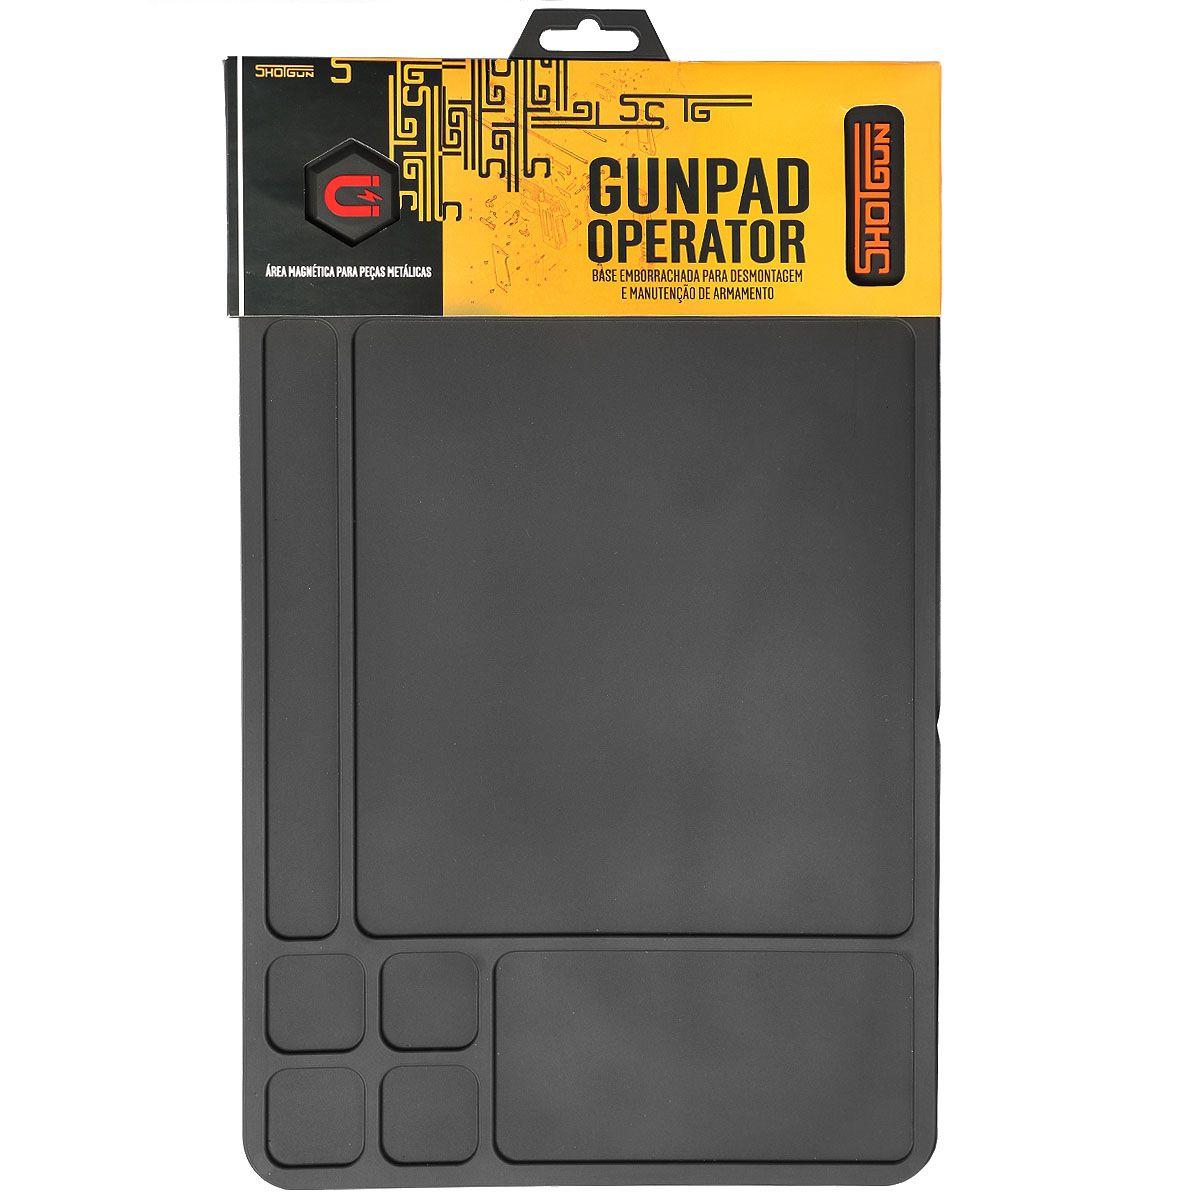 GunPad Operator - Shotgun